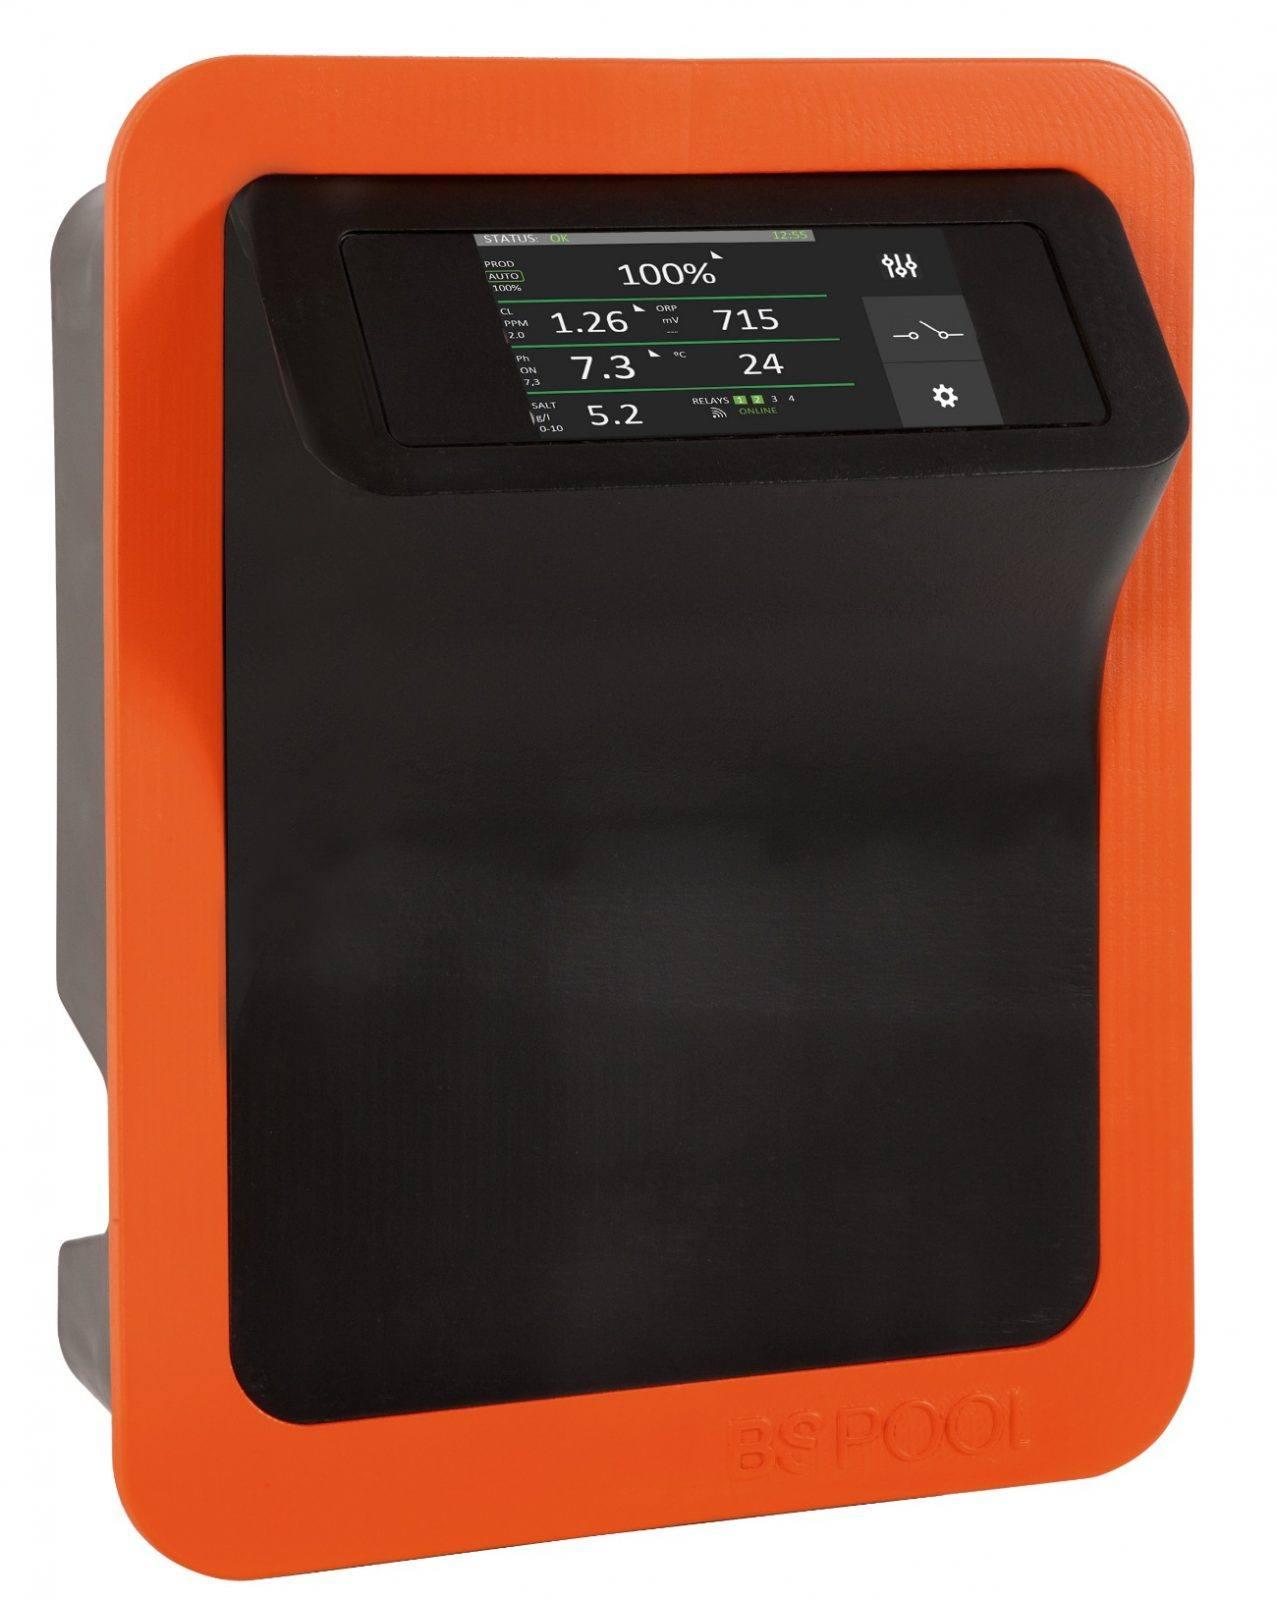 Clorador BSPOOL IOT 2018, el primer clorador IOT del mercado